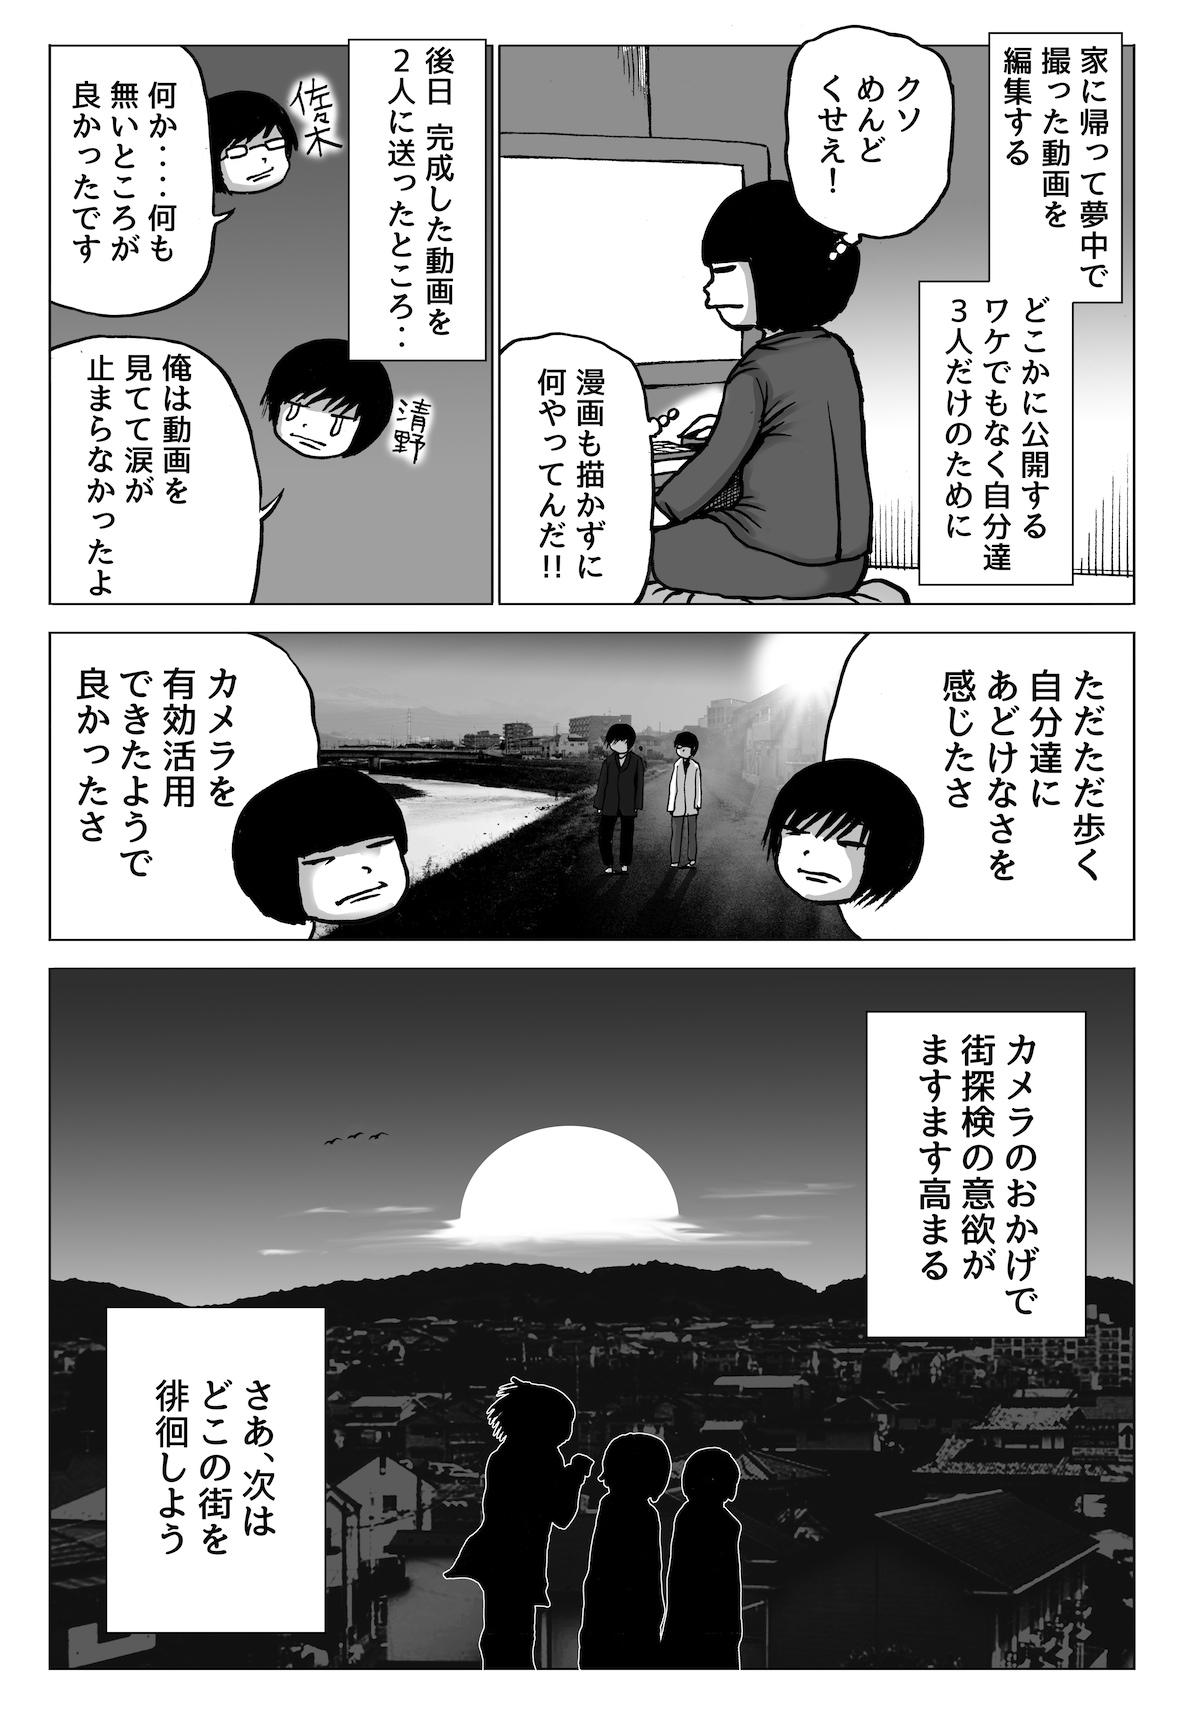 https://cdn-ak.f.st-hatena.com/images/fotolife/b/blog-media/20160210/20160210115828_original.jpg